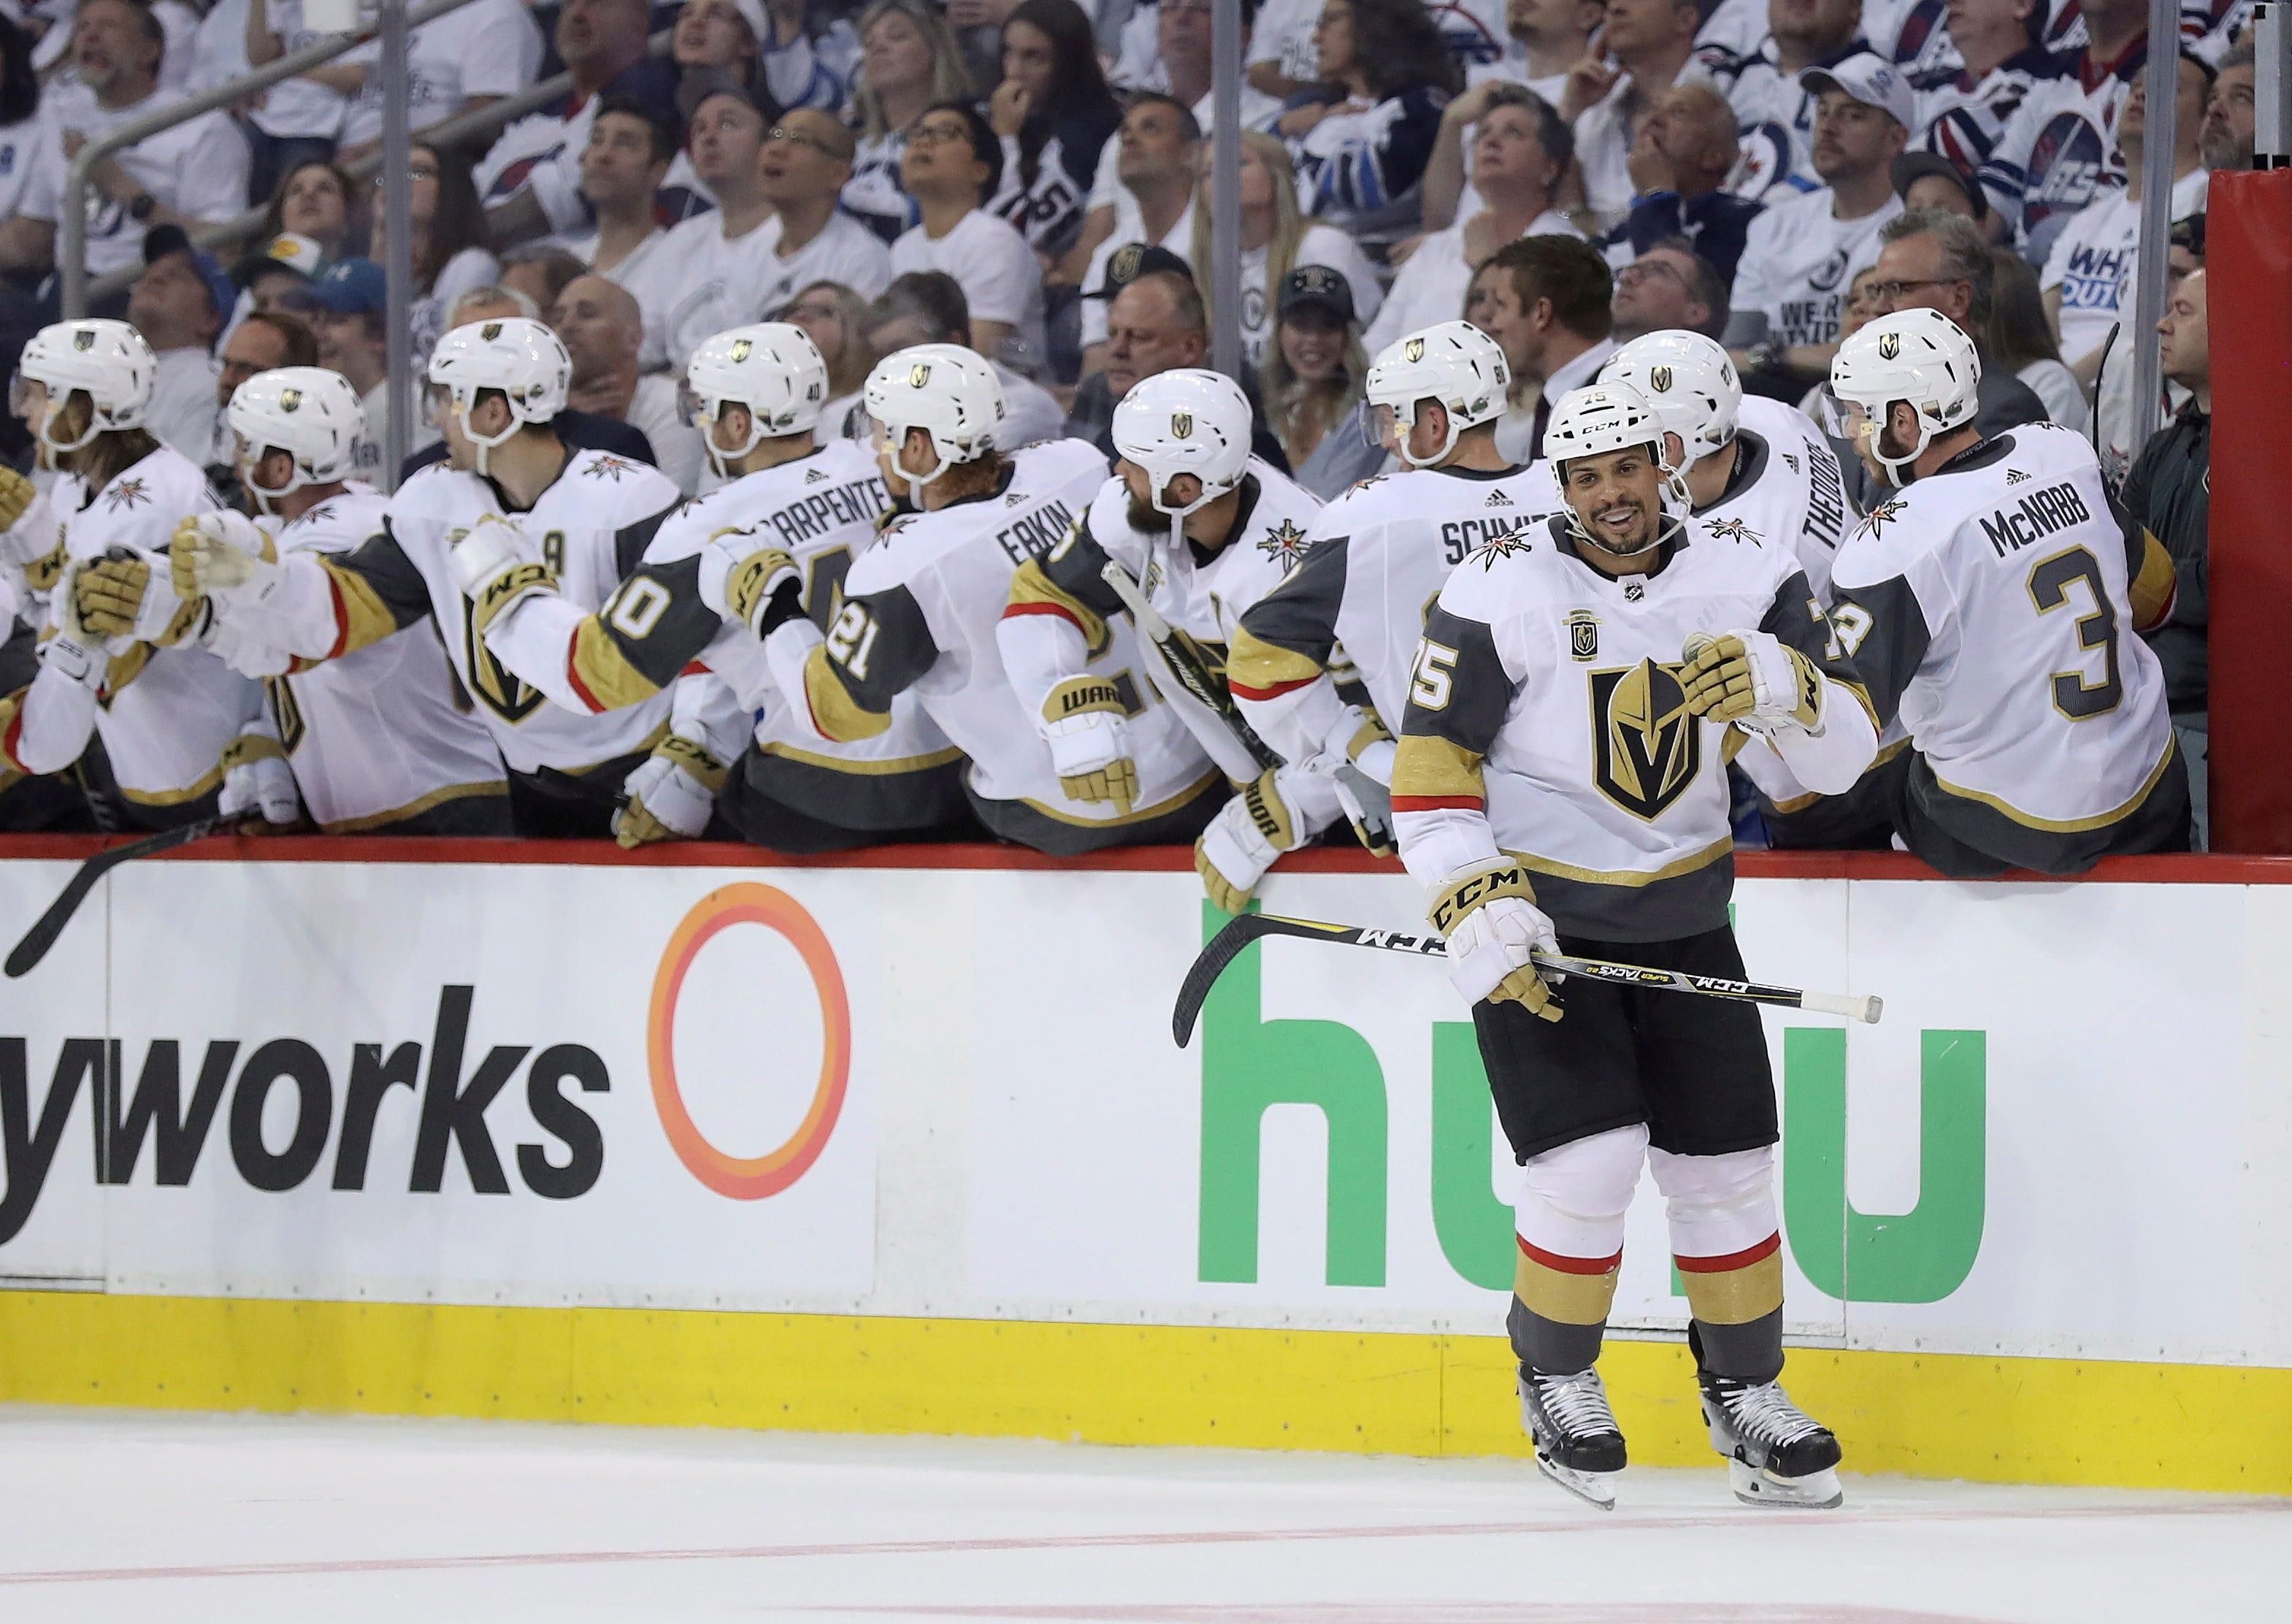 George McPhee's strategic moves help Vegas reach Cup Final